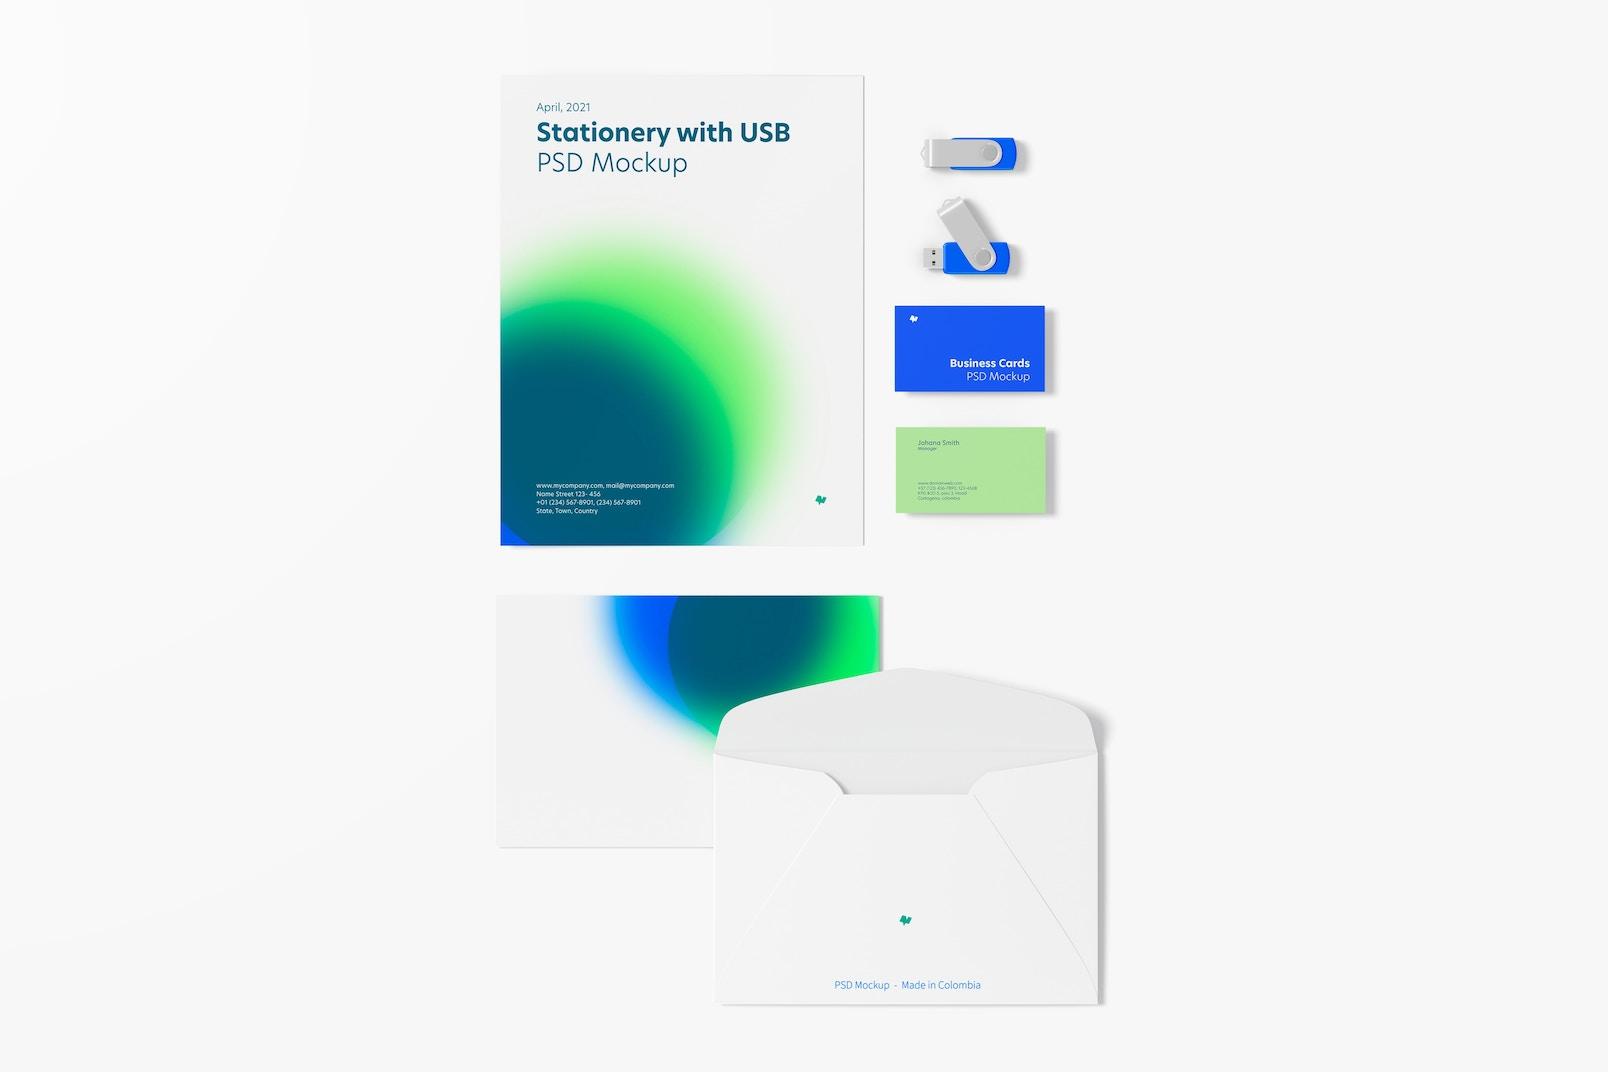 Maqueta de Papelería con Memorias USB, Vista Superior 02